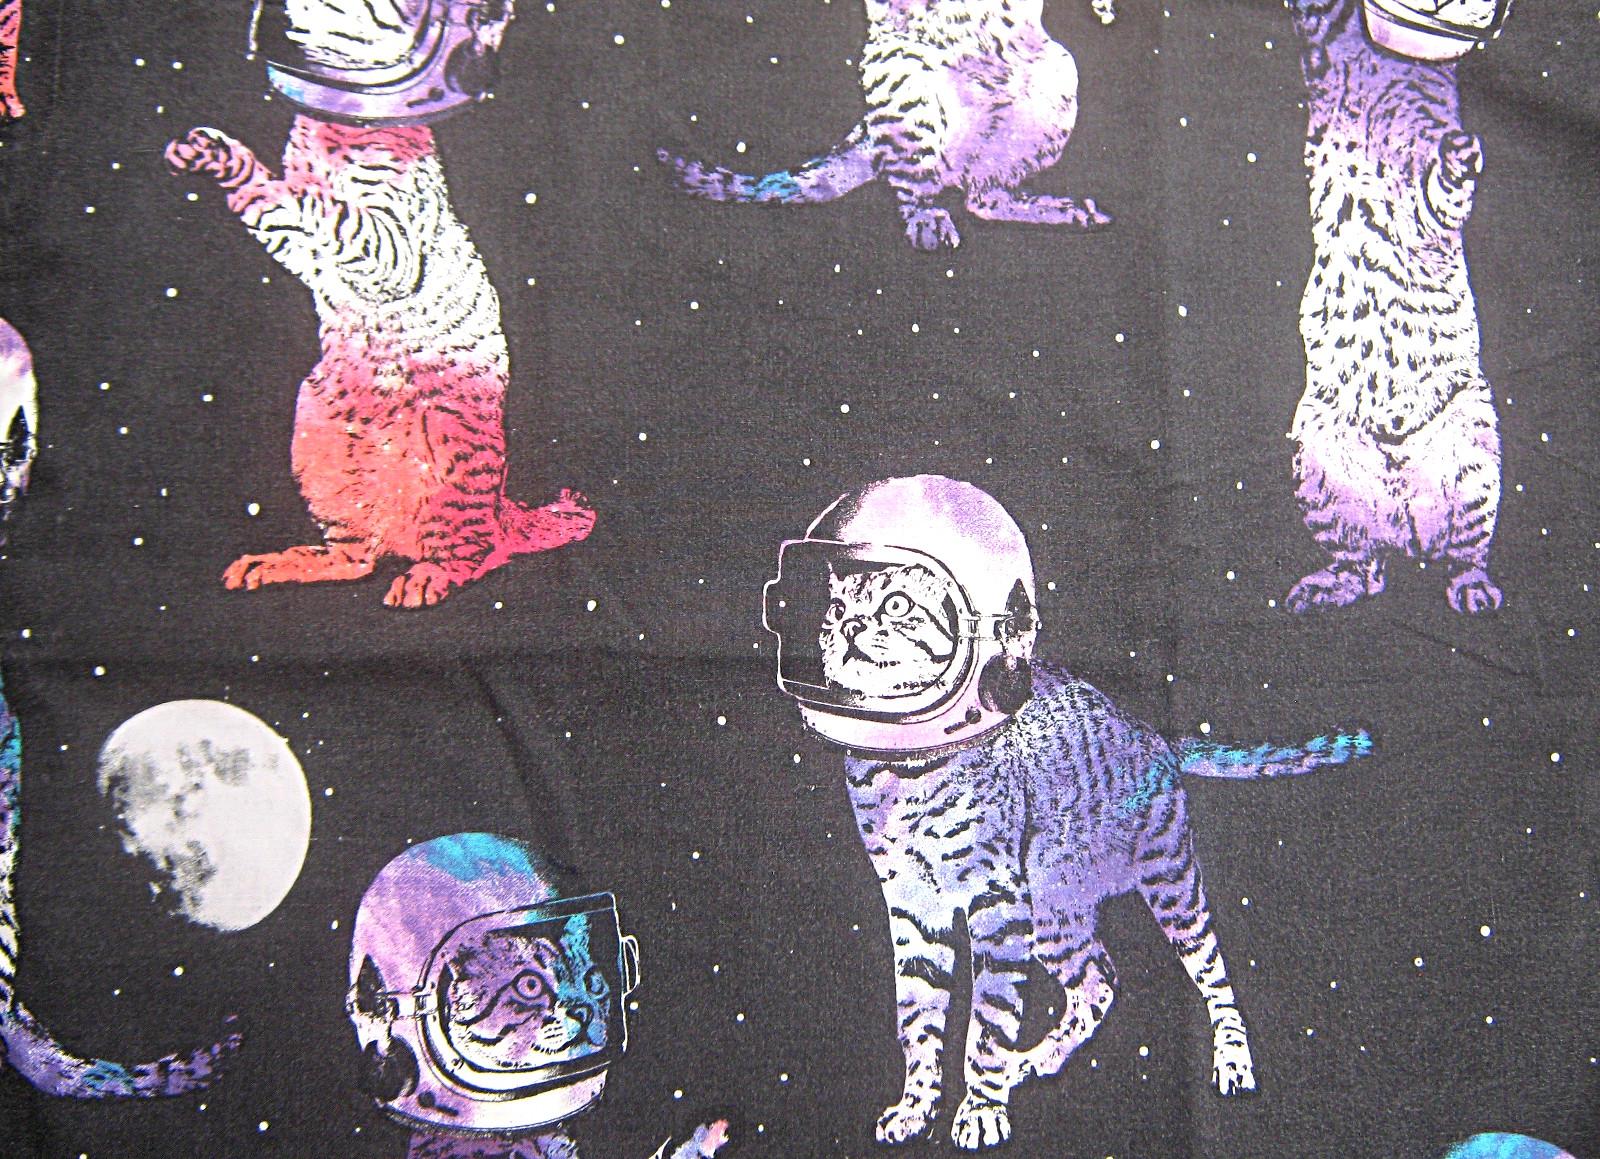 Black-purple-red-blue-space-cats-polycotton